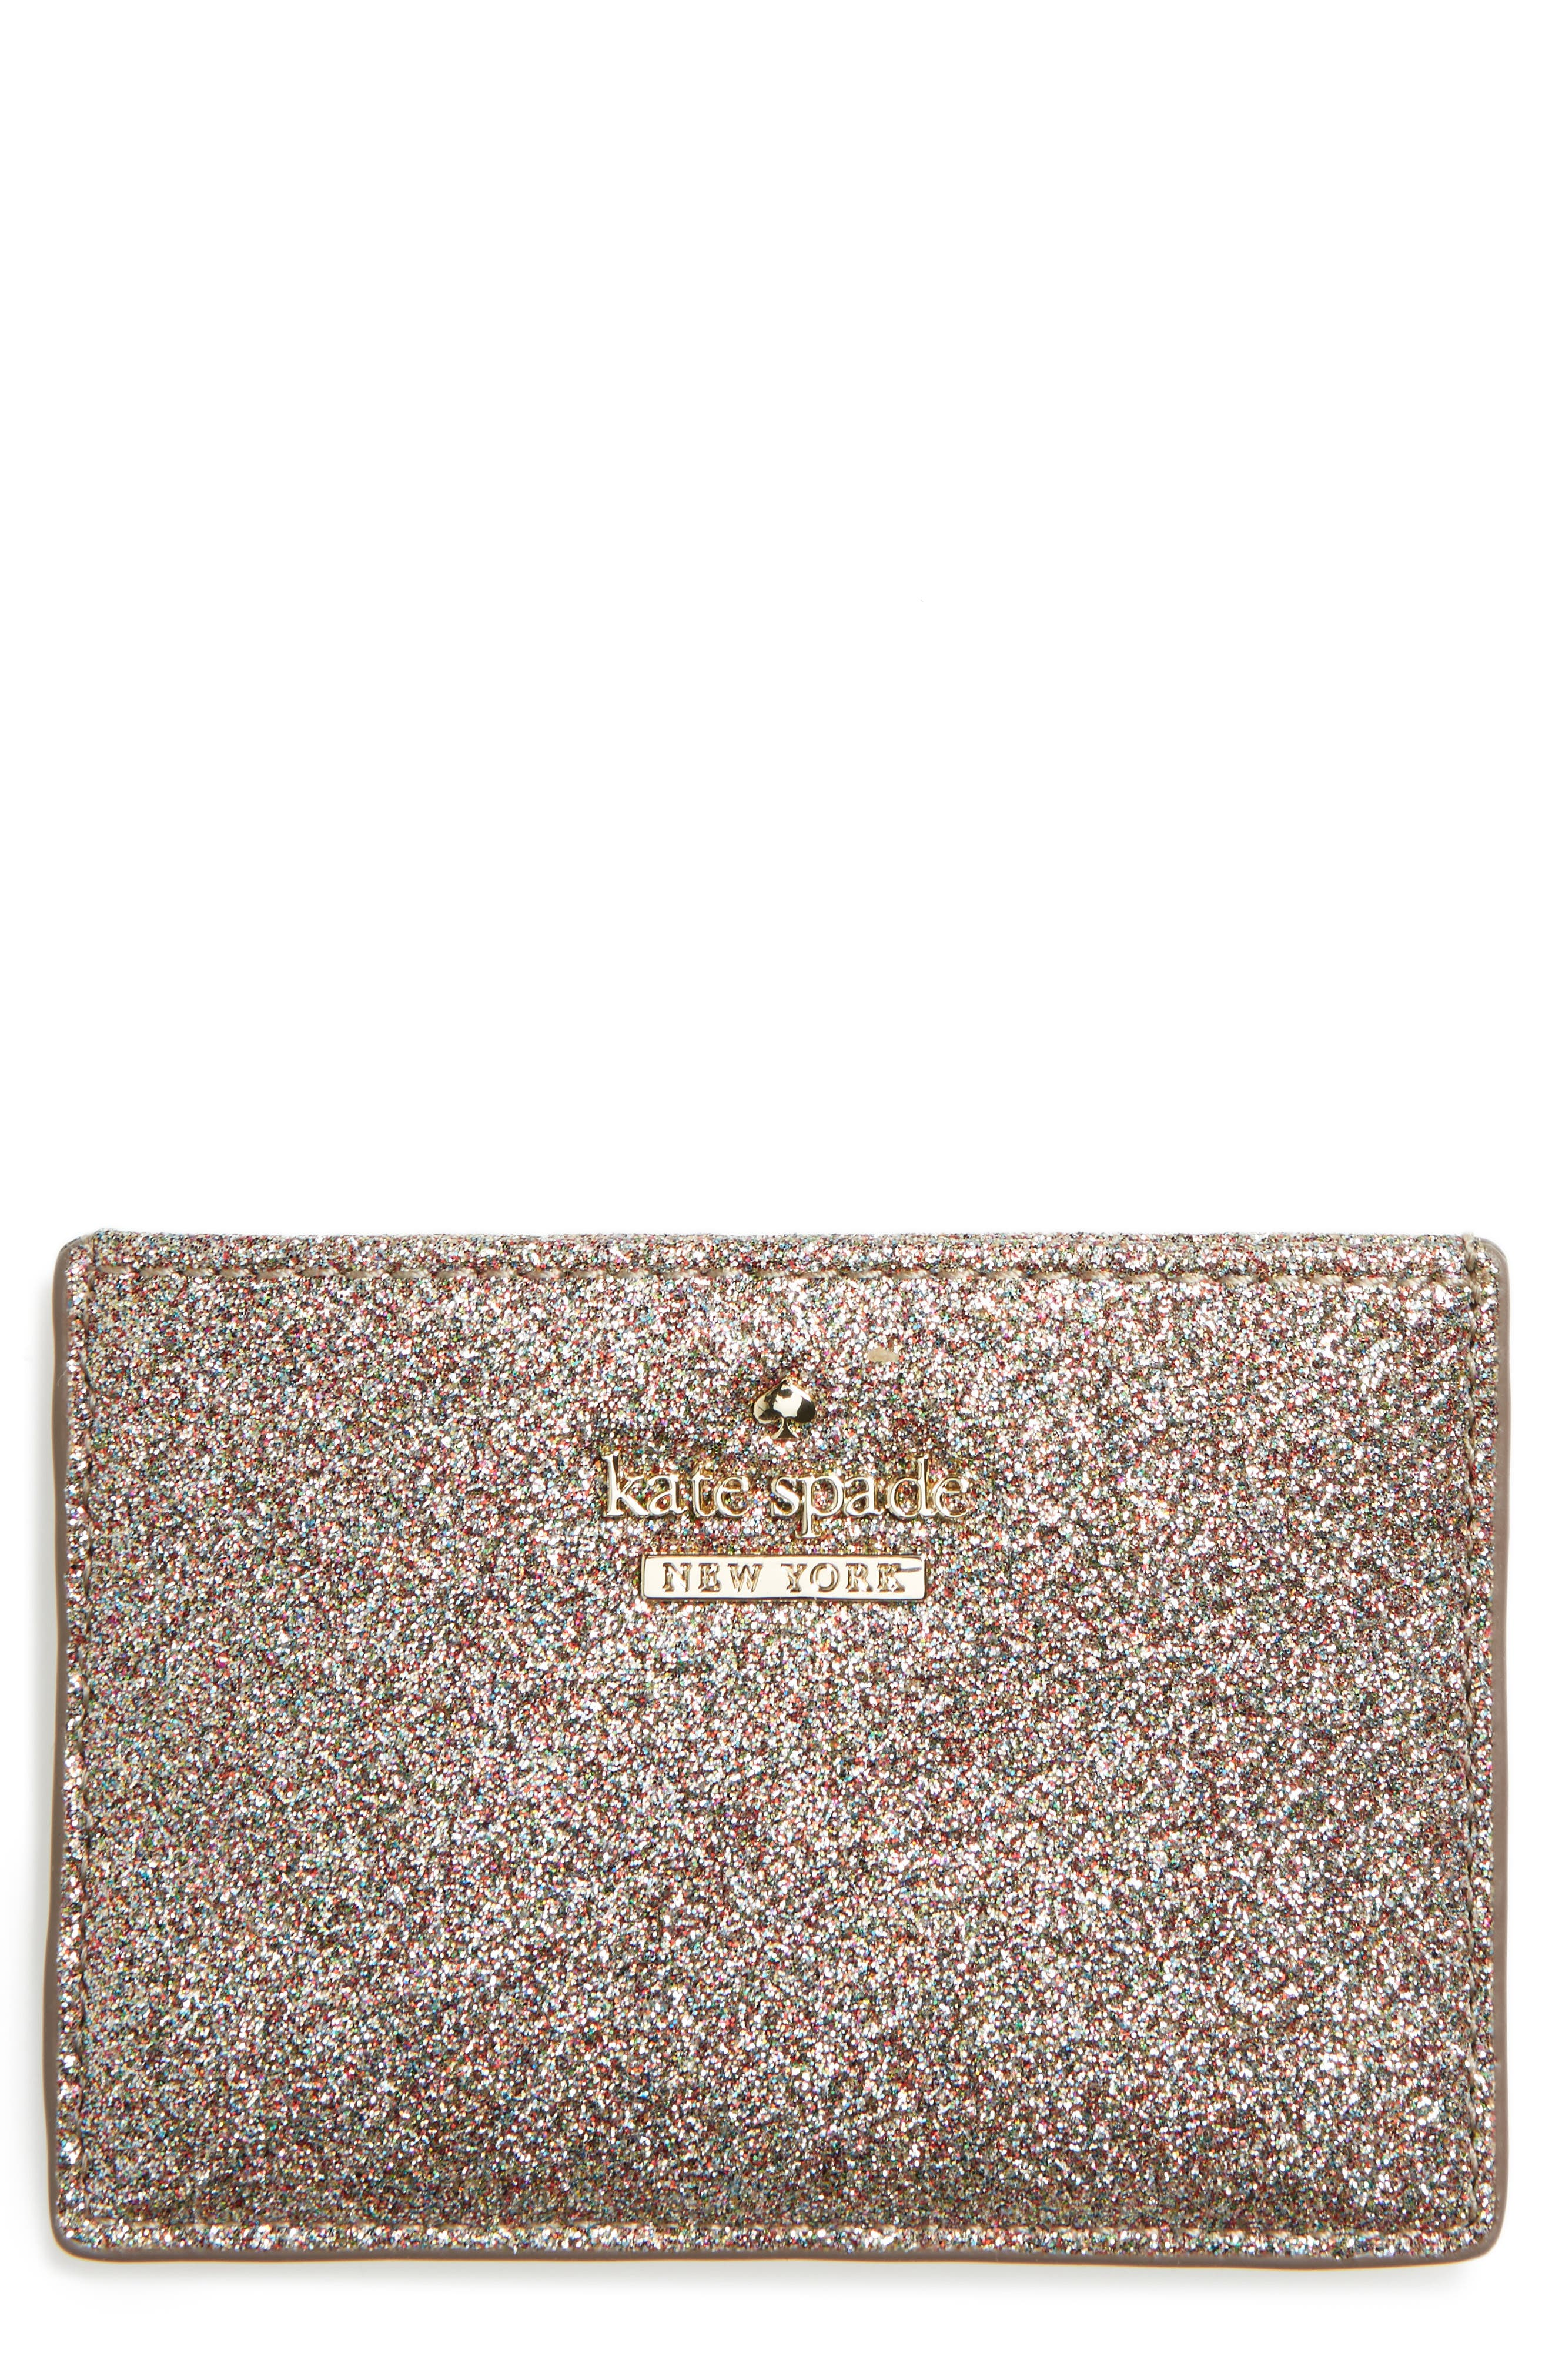 kate spade new york burgess court glitter card holder